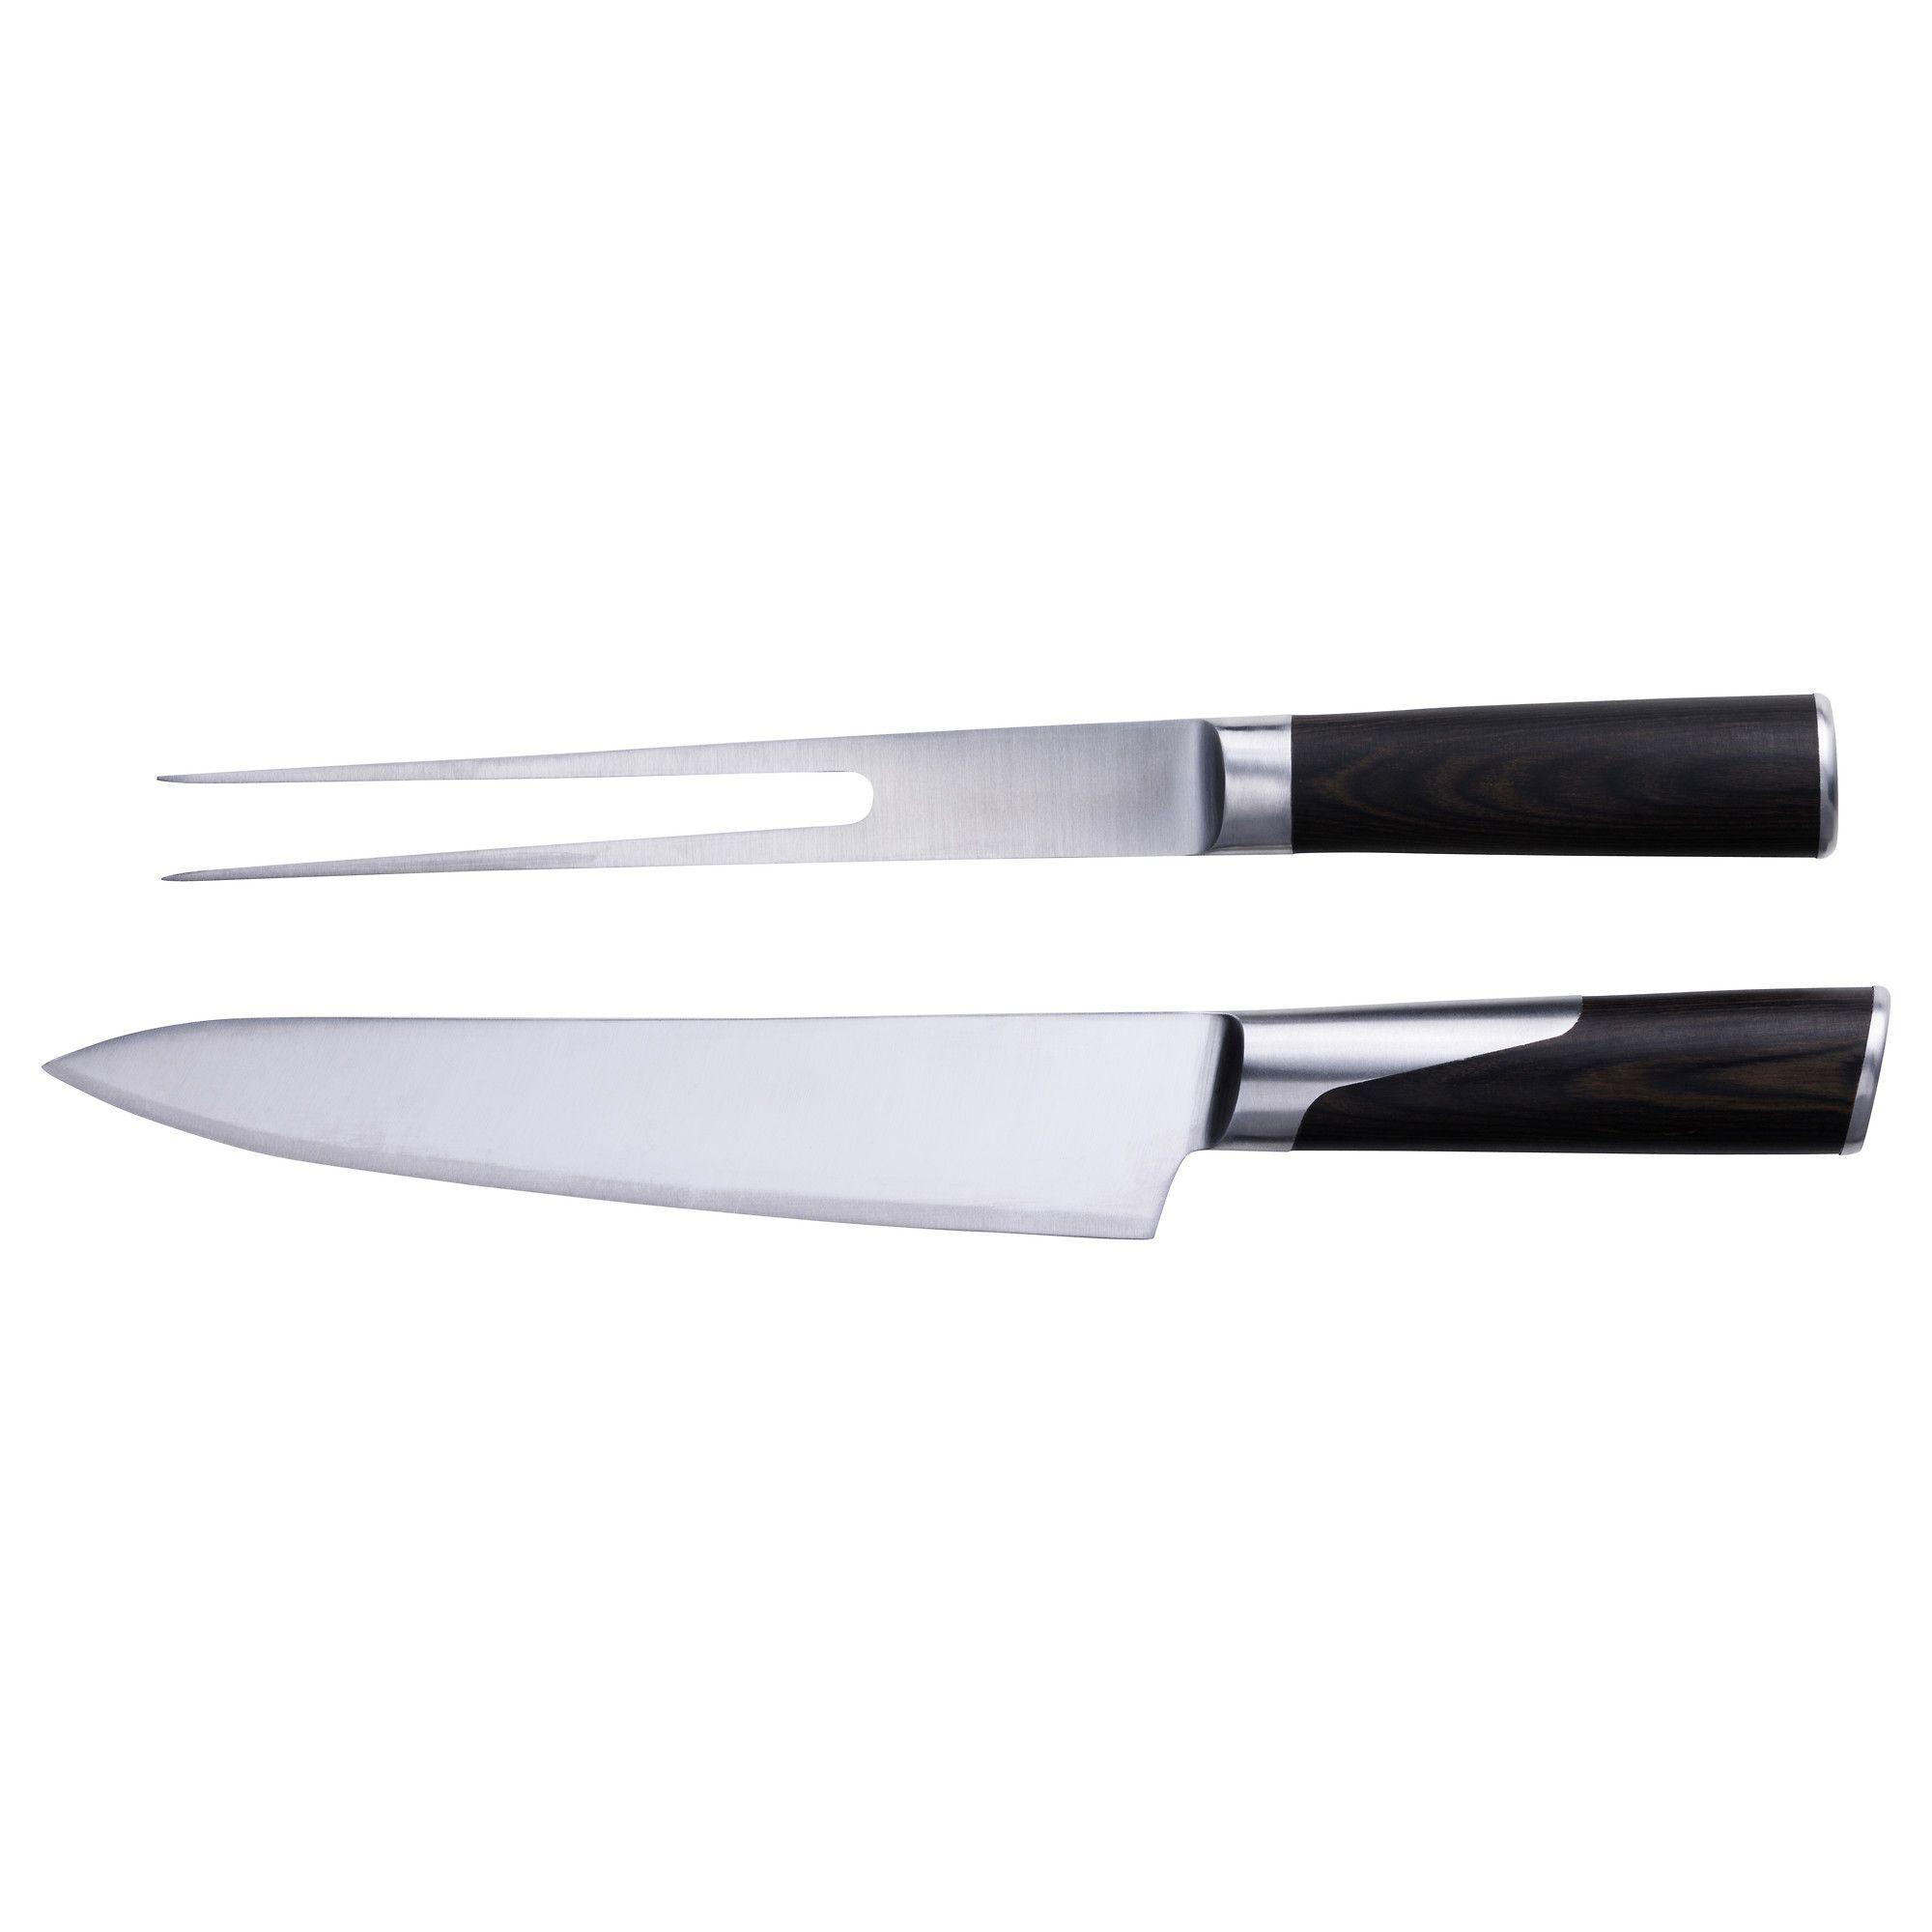 SLITBAR Carving Knife And Fork - IKEA